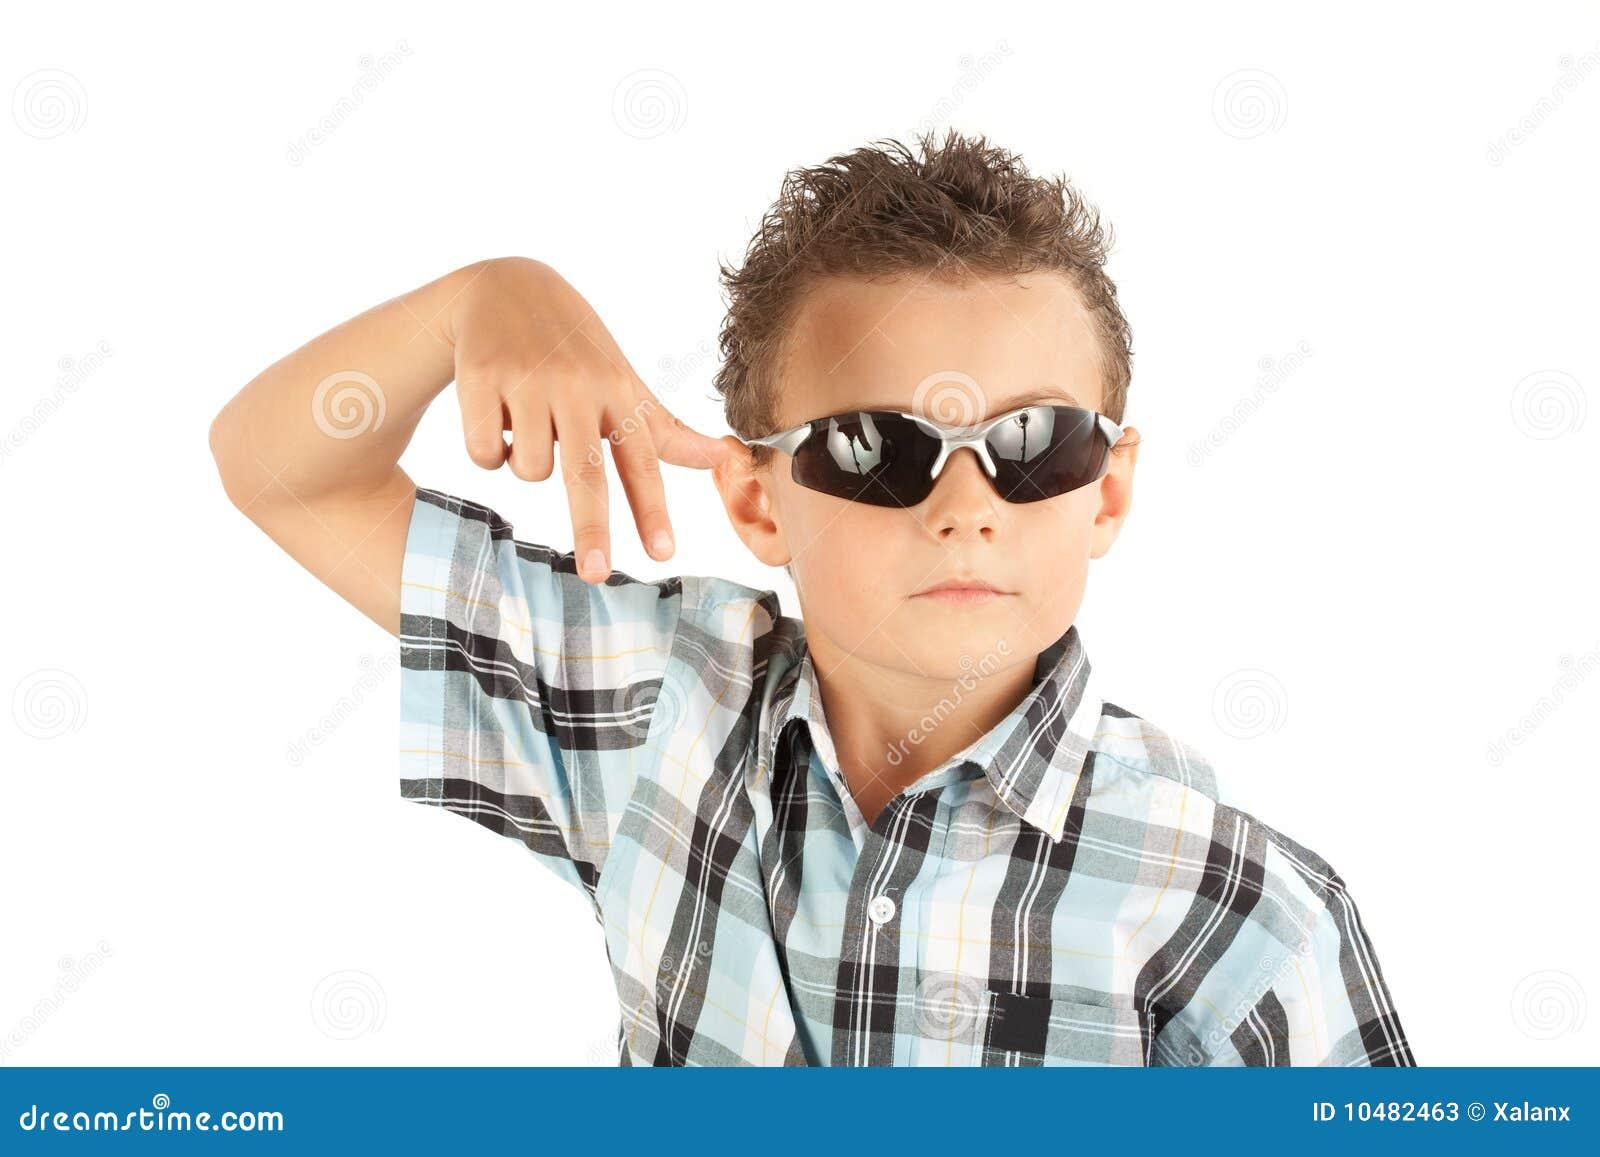 Cool Kid Stock Image Image Of Strong Joyful Sunglasses